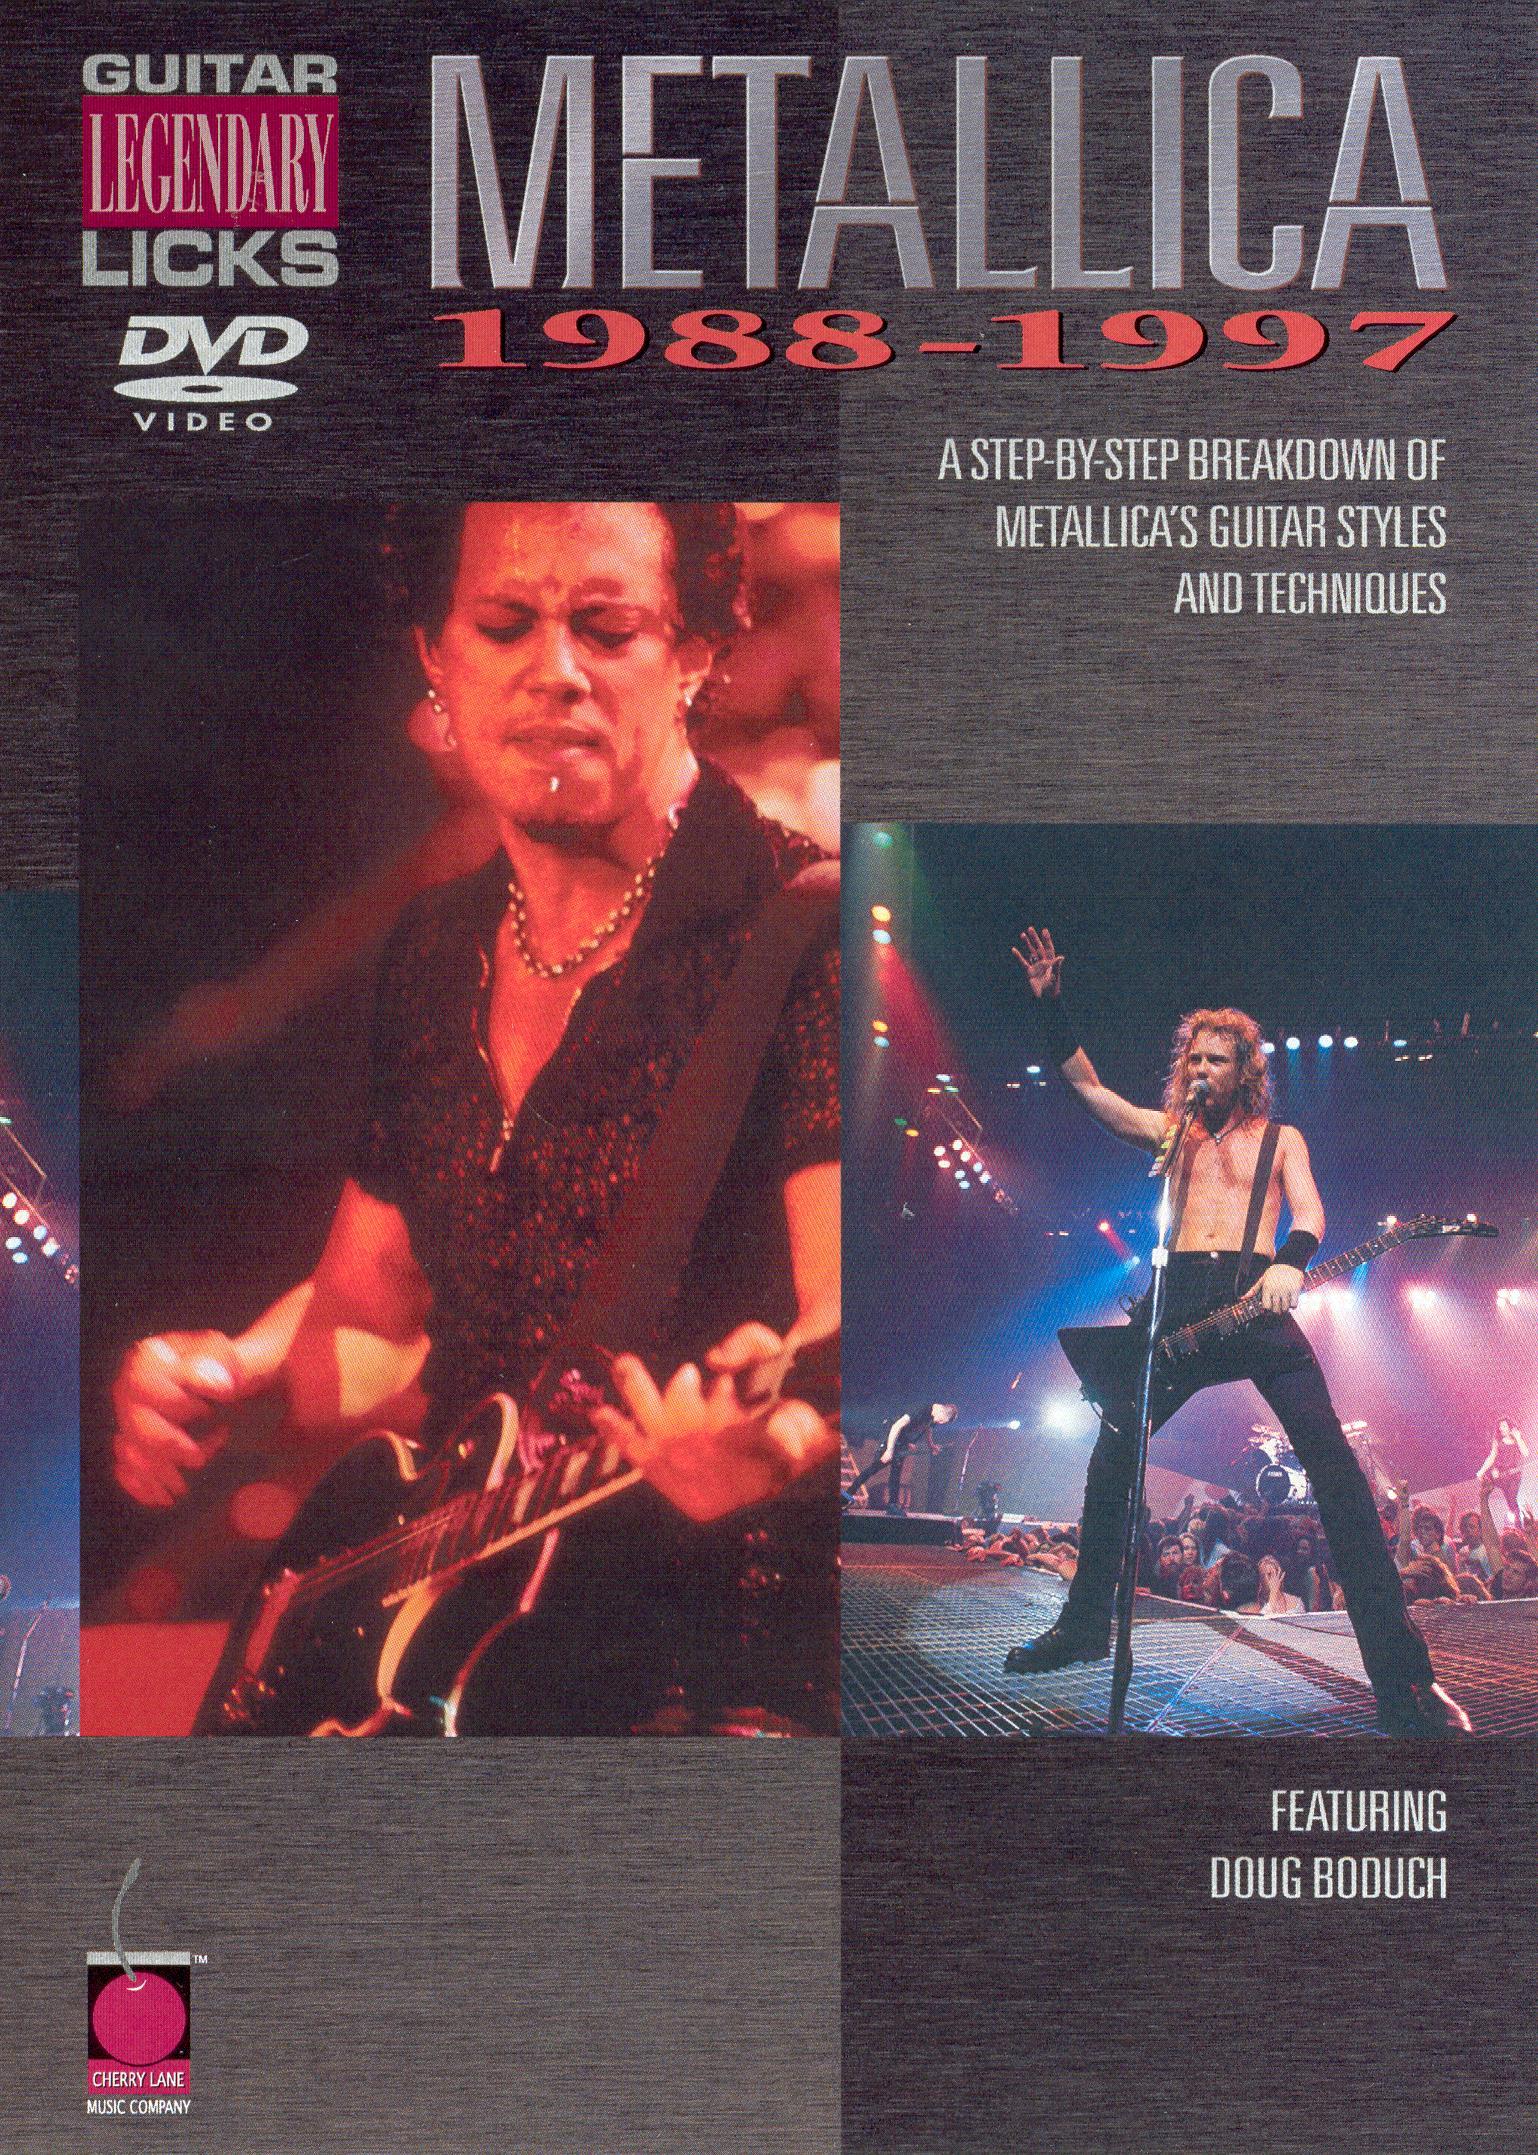 Metallica: Legendary Licks - Guitar, 1988-1997